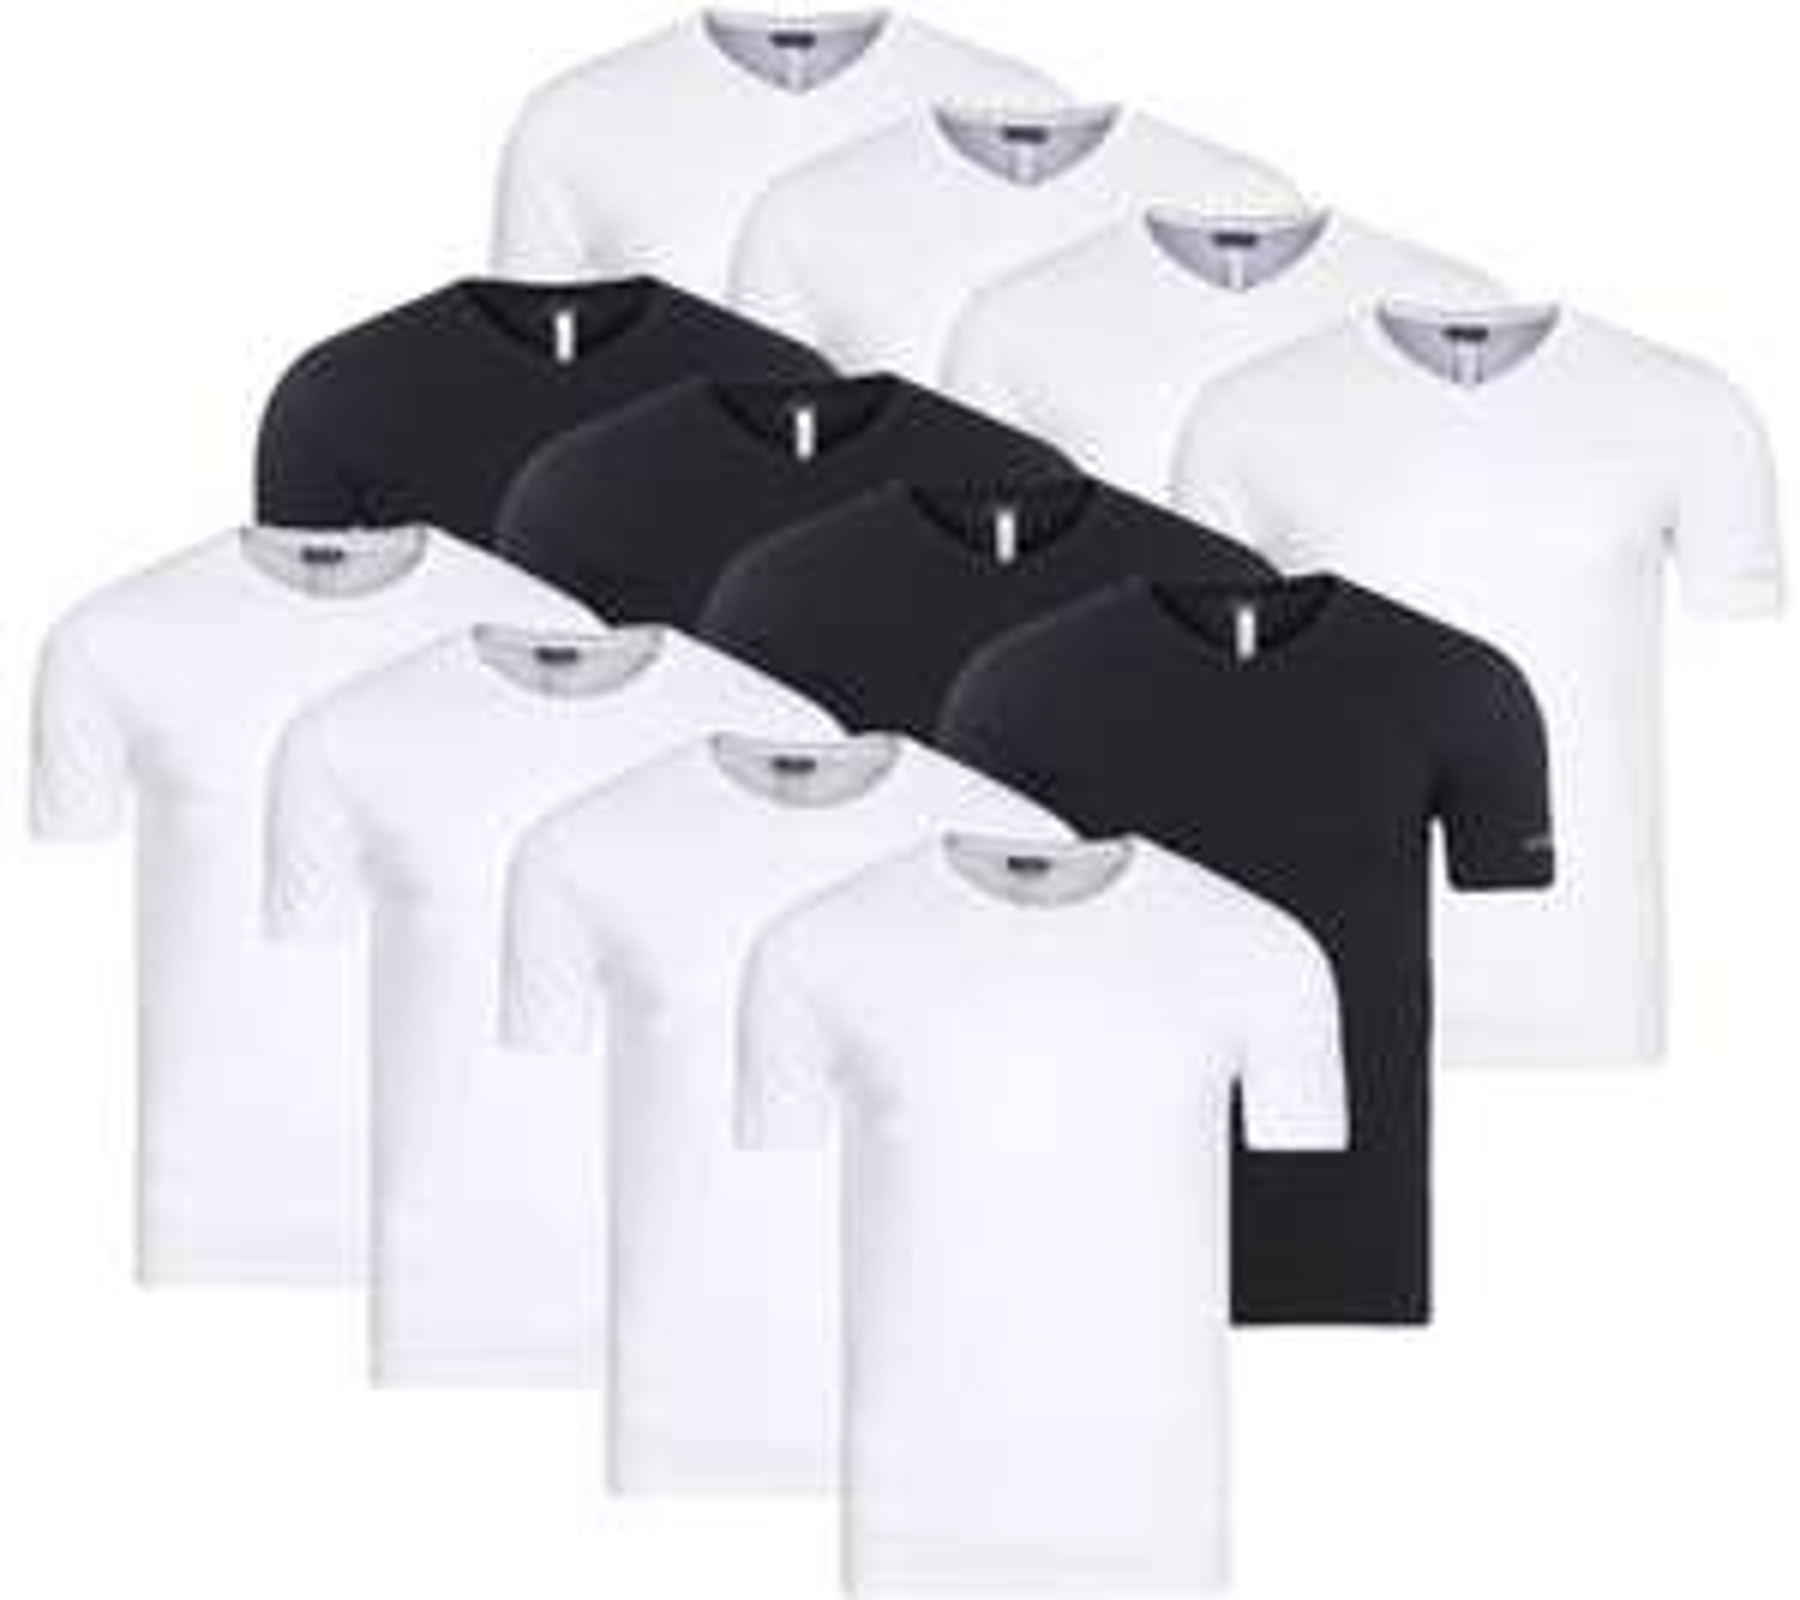 [Outlet46] 4er Pack Kappa Sebbo 2 (V-Ausschnitt) & Tobias (Rundhals) Herren T-Shirt -- 100% Baumwolle --- M - XXL